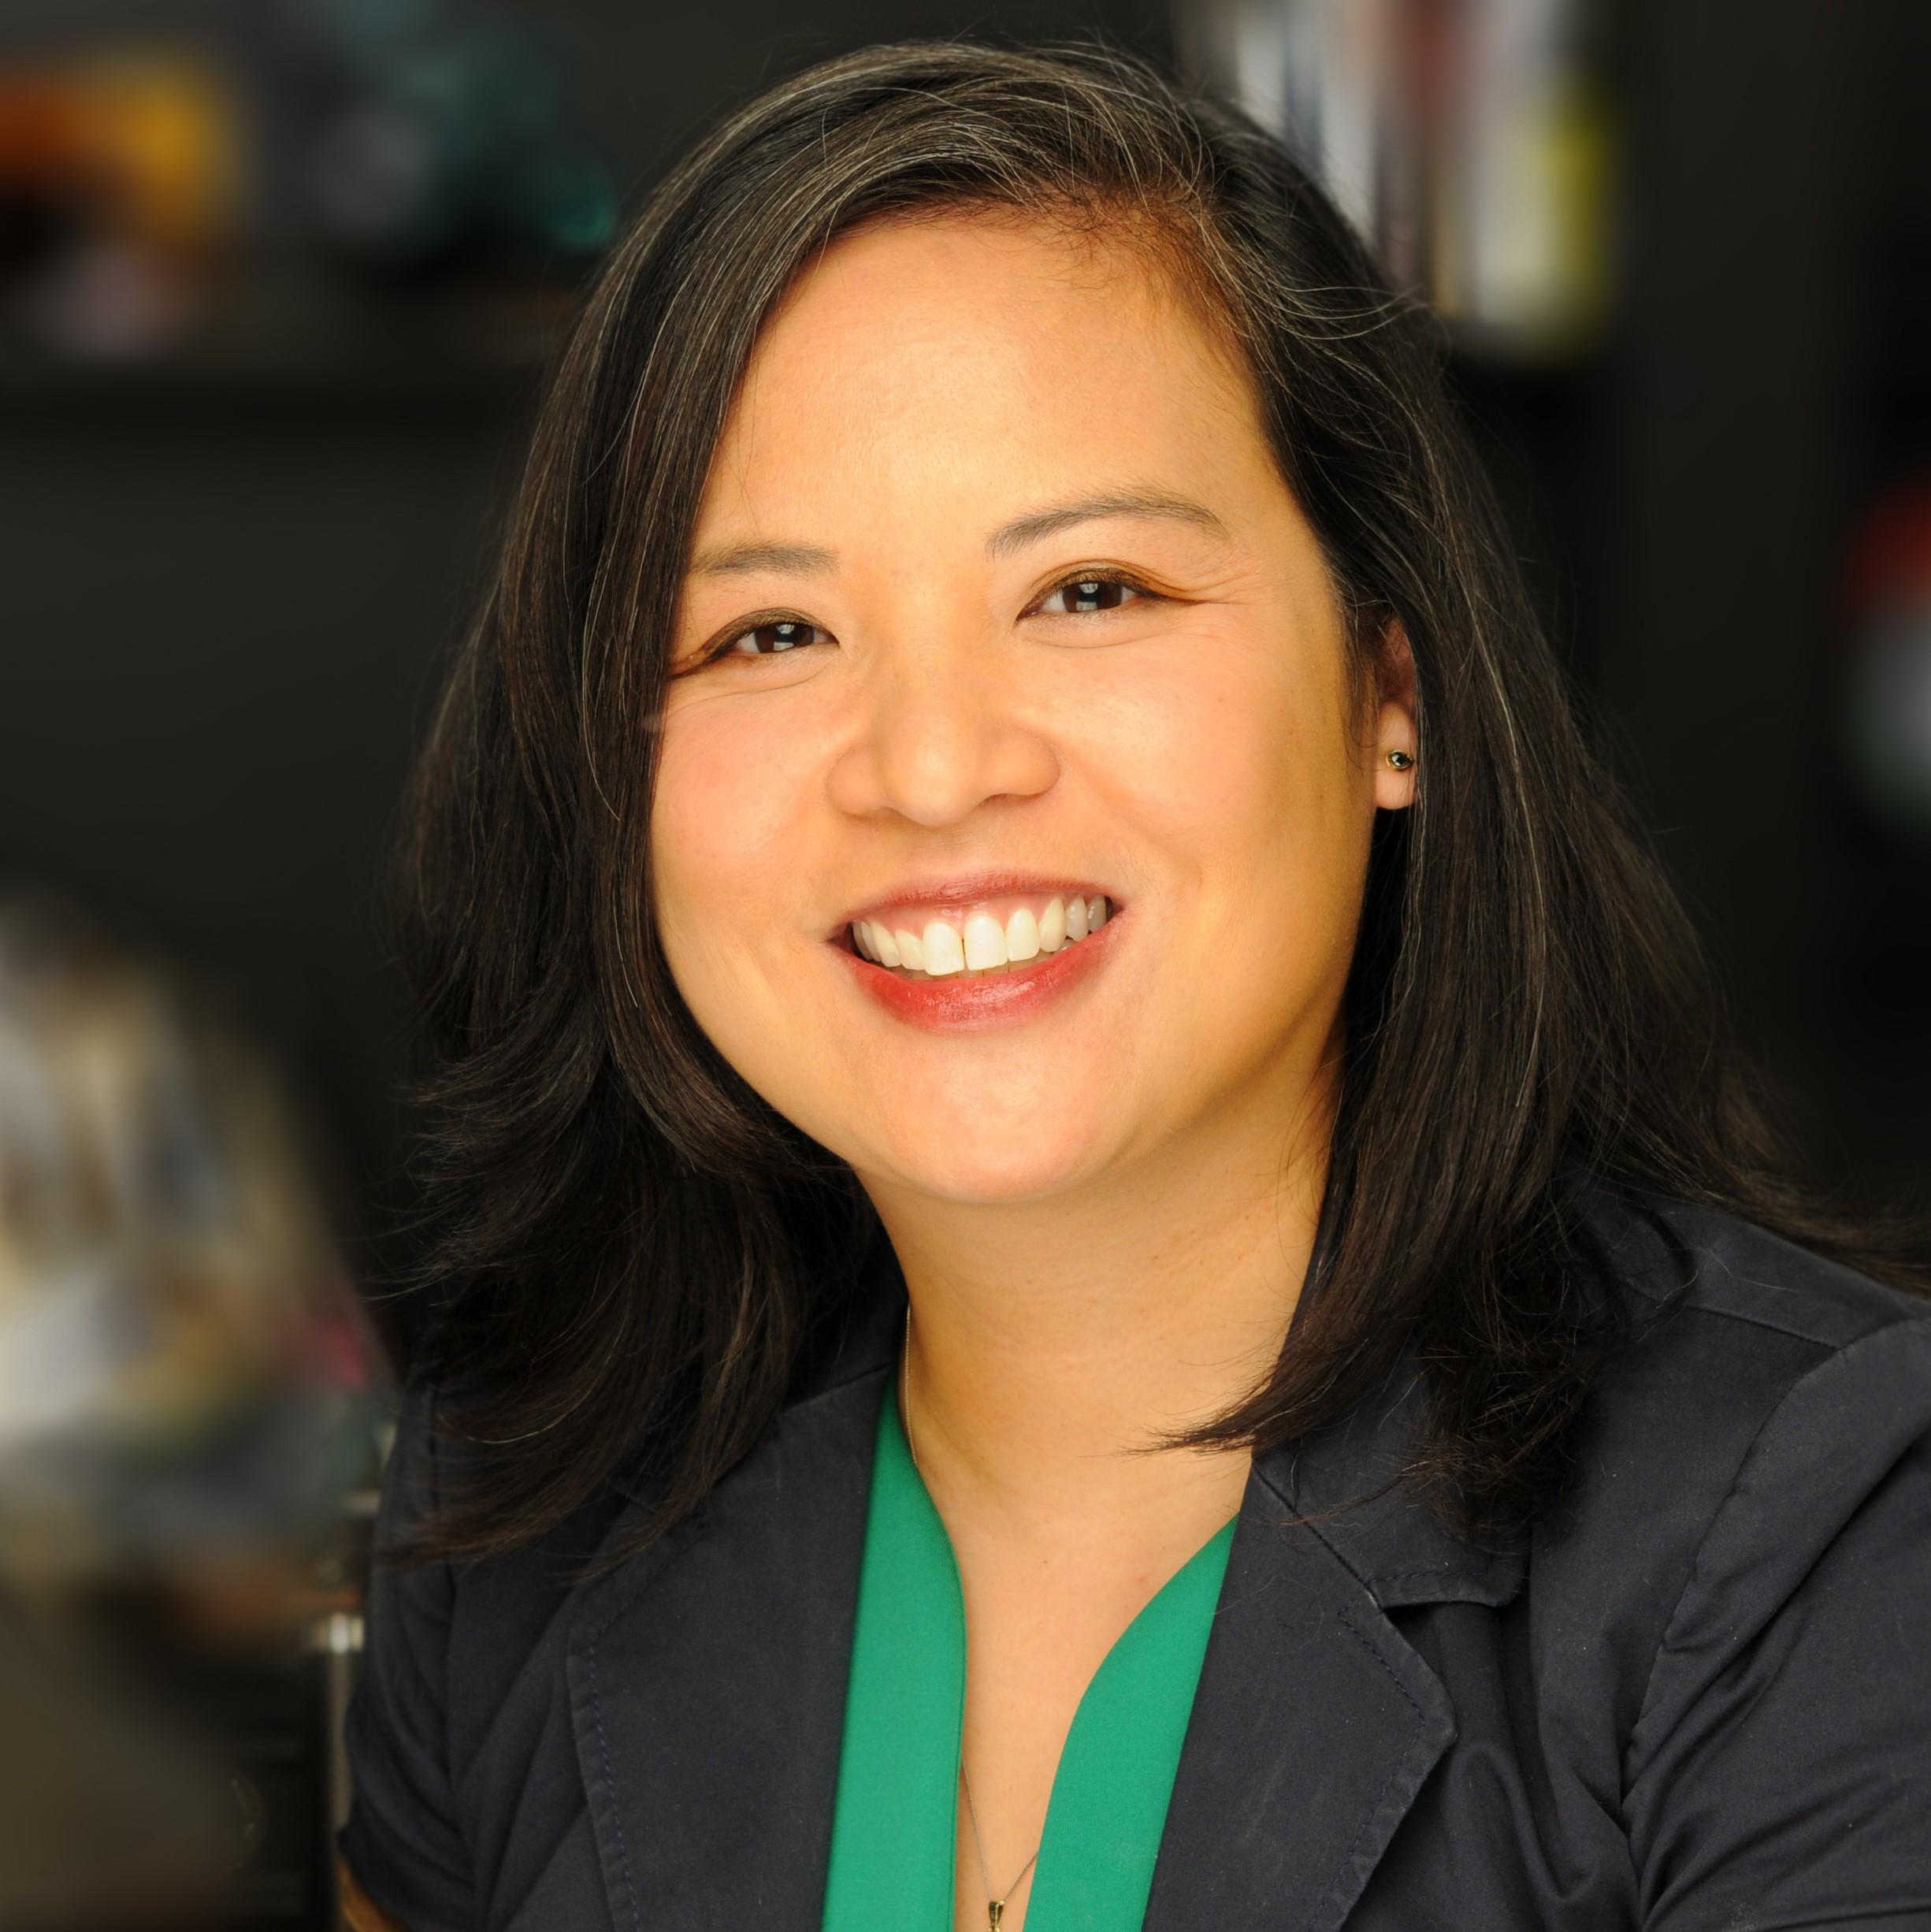 Michelle Legaspi Sánchez